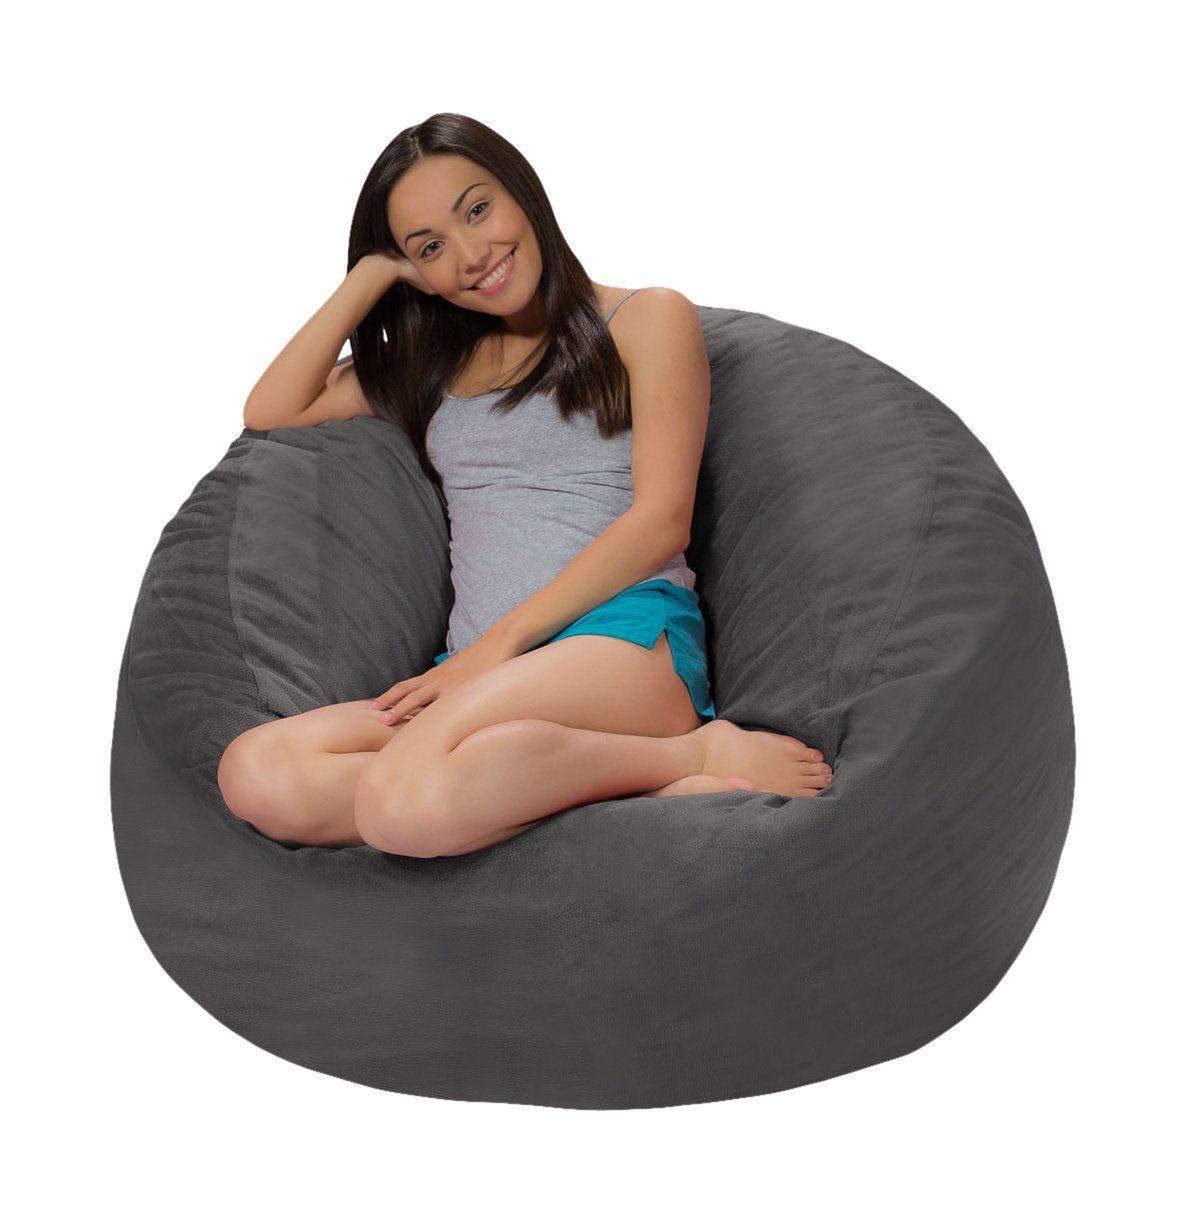 Admirable Comfy Sacks 4 Ft Memory Foam Bean Bag Chair Grey Pebble Andrewgaddart Wooden Chair Designs For Living Room Andrewgaddartcom